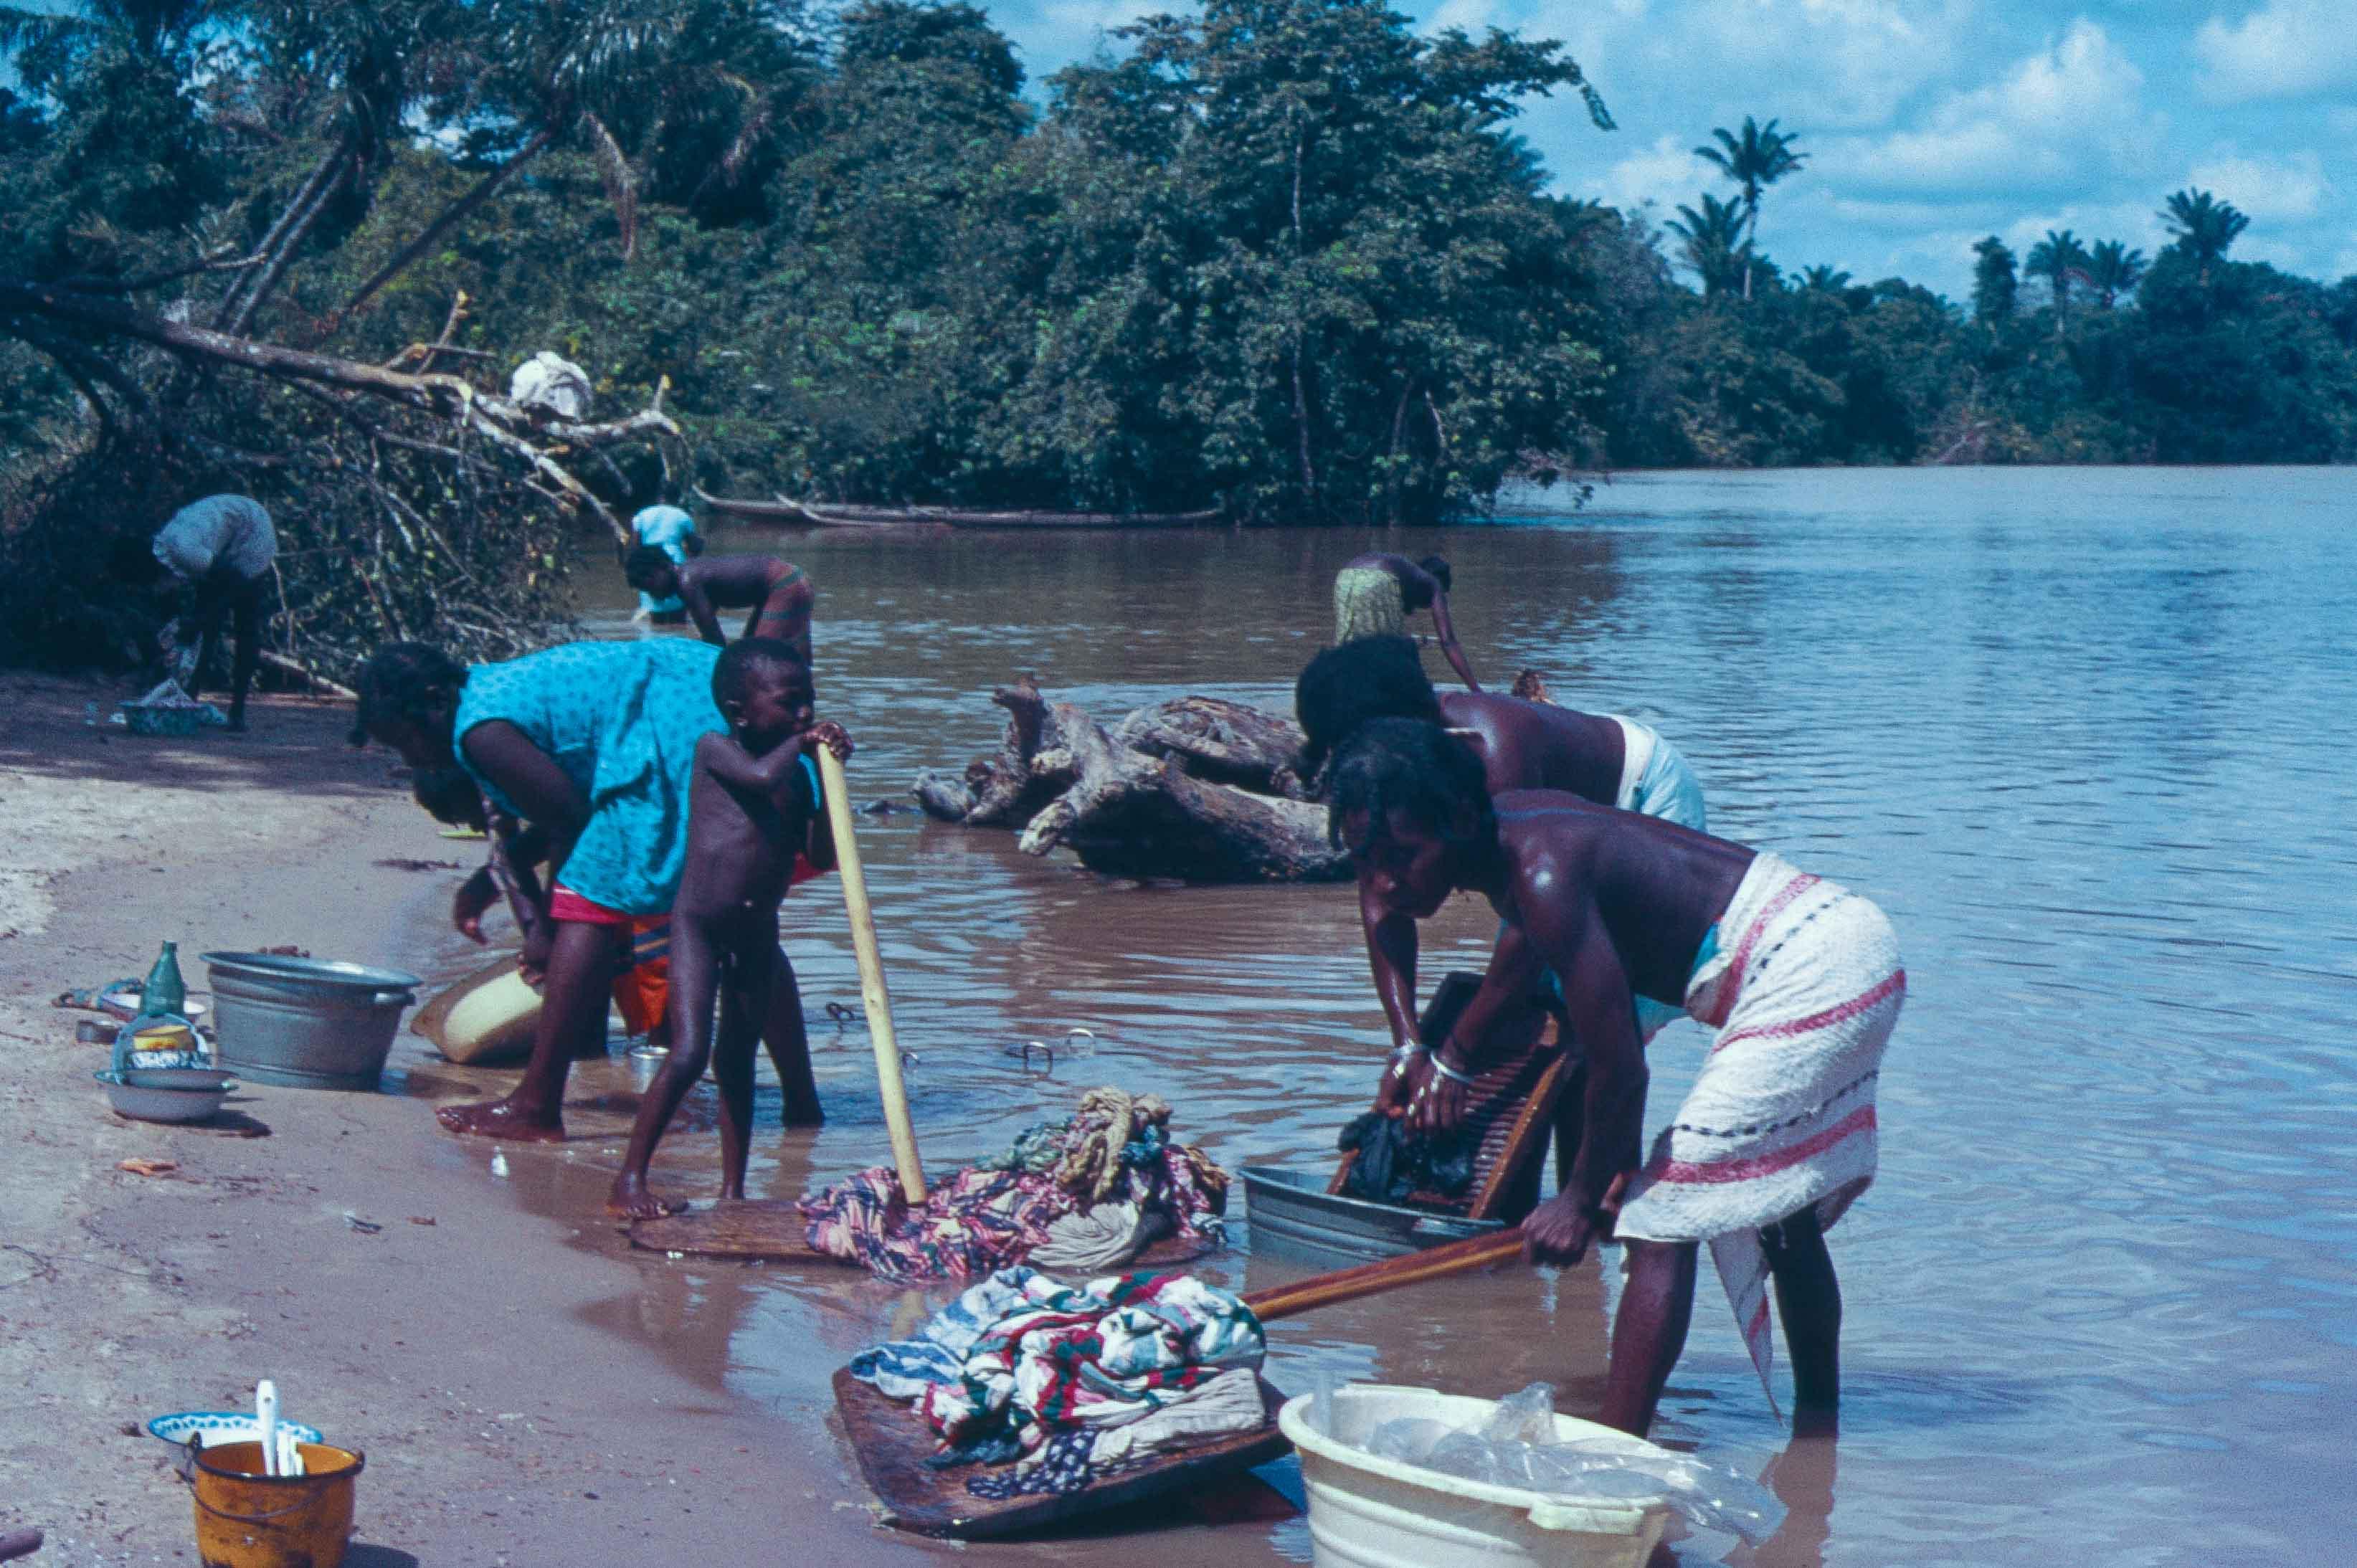 535. Suriname